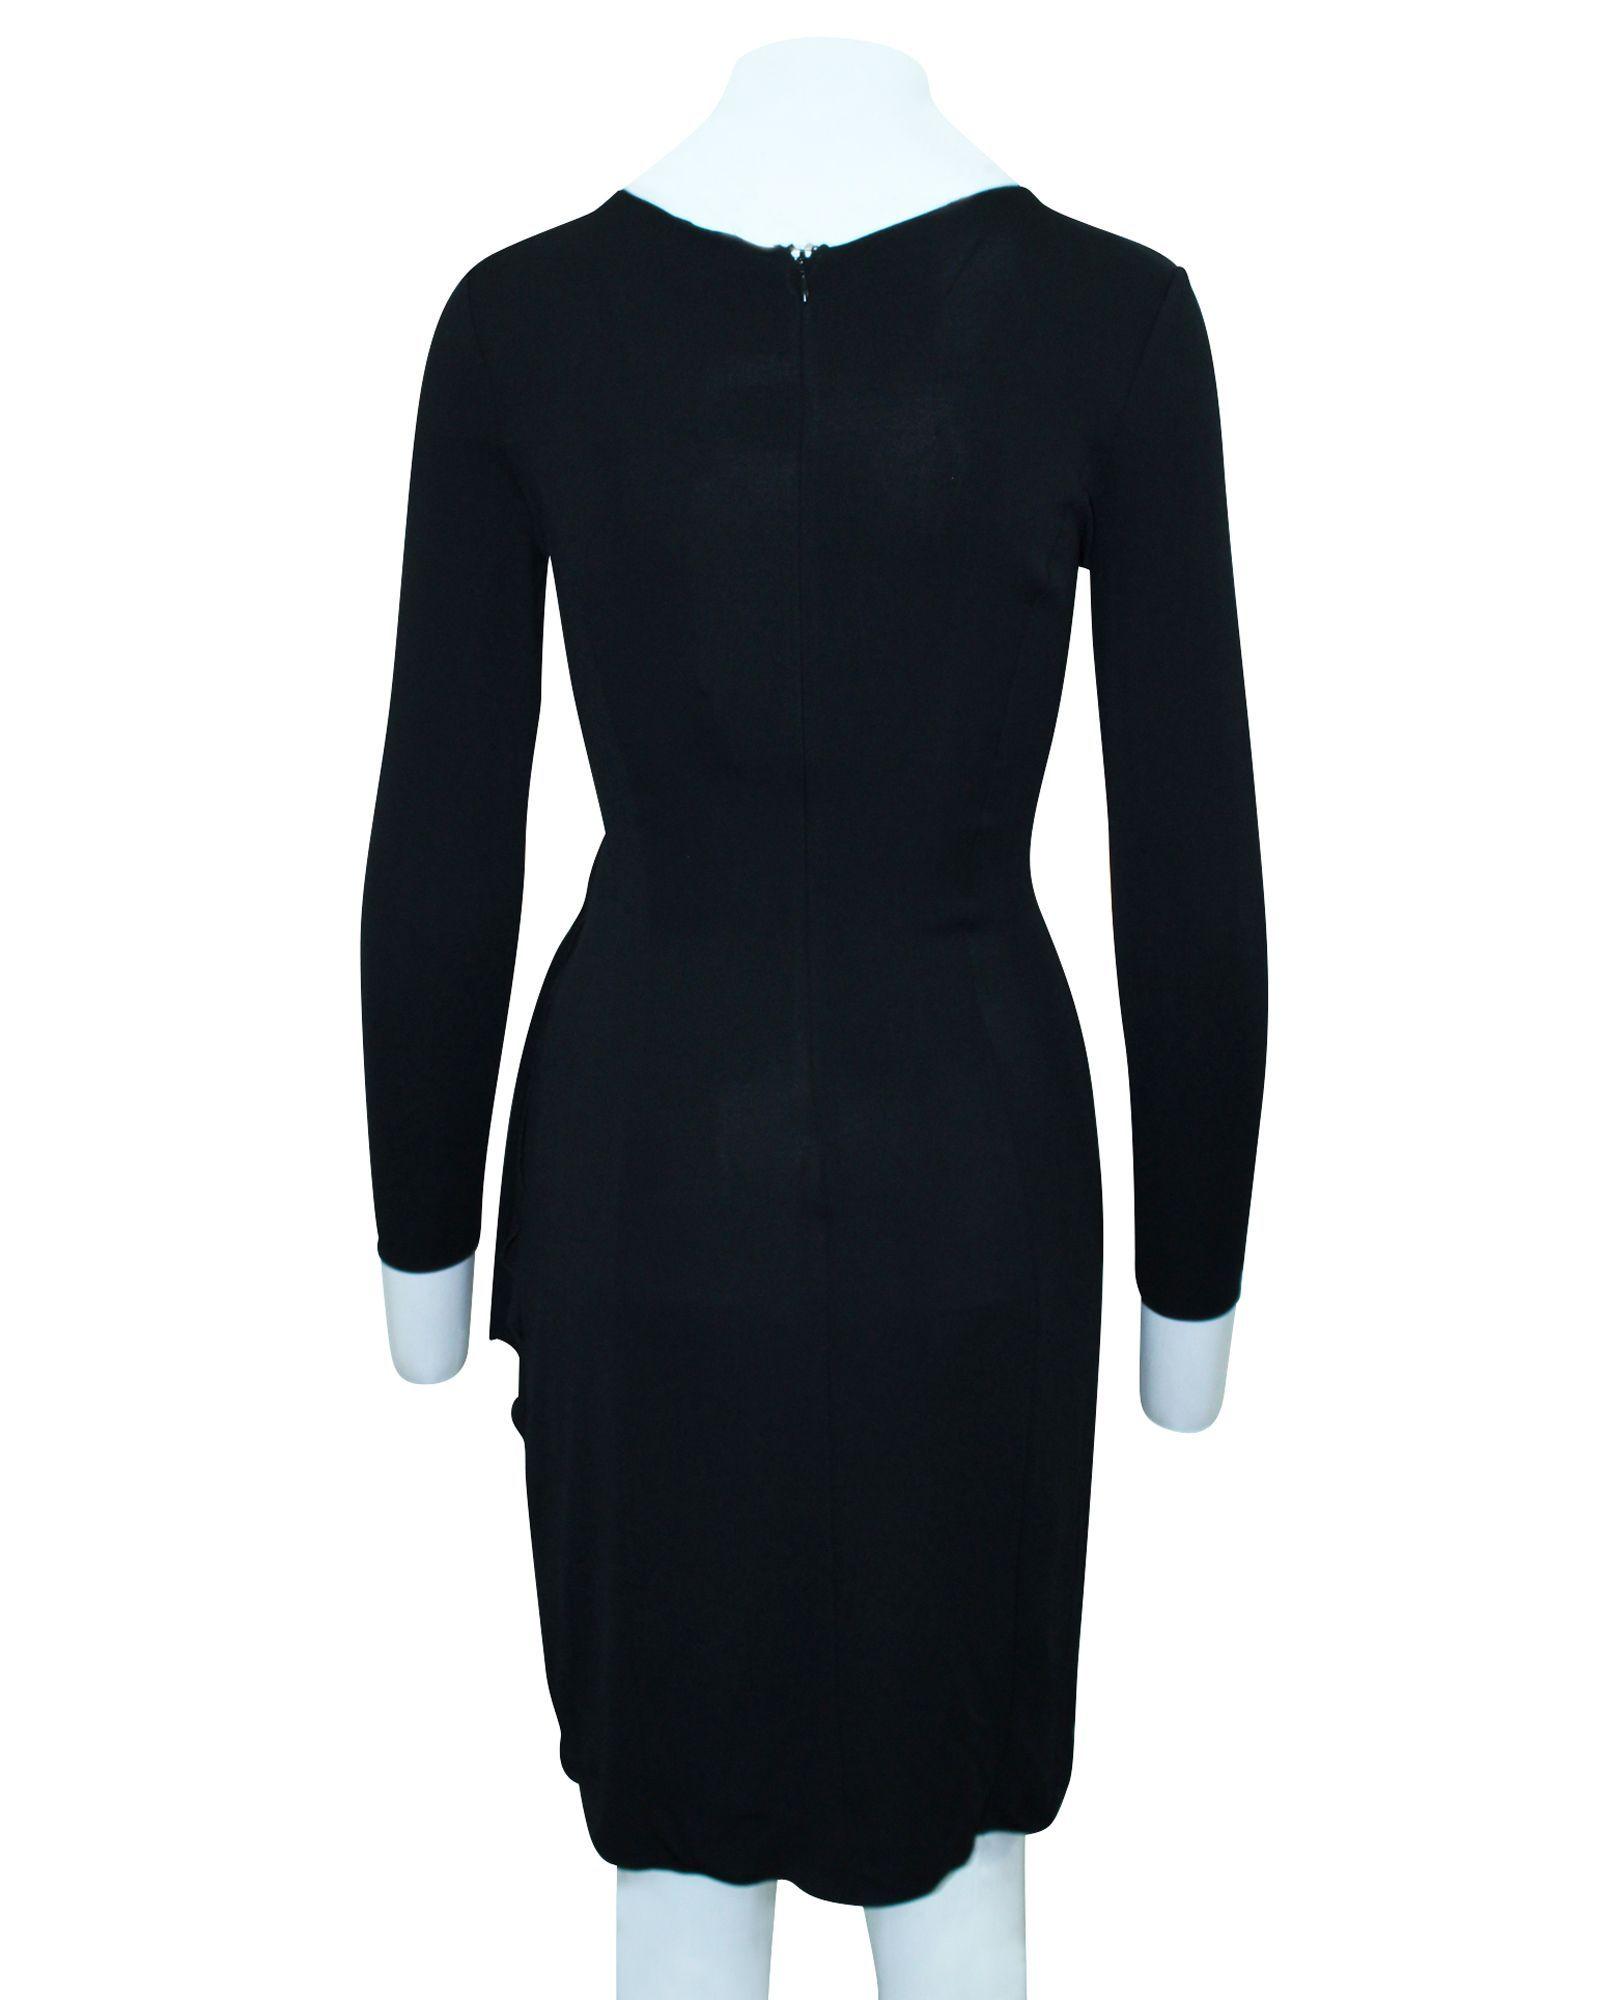 Armani Black Longsleeves Dress